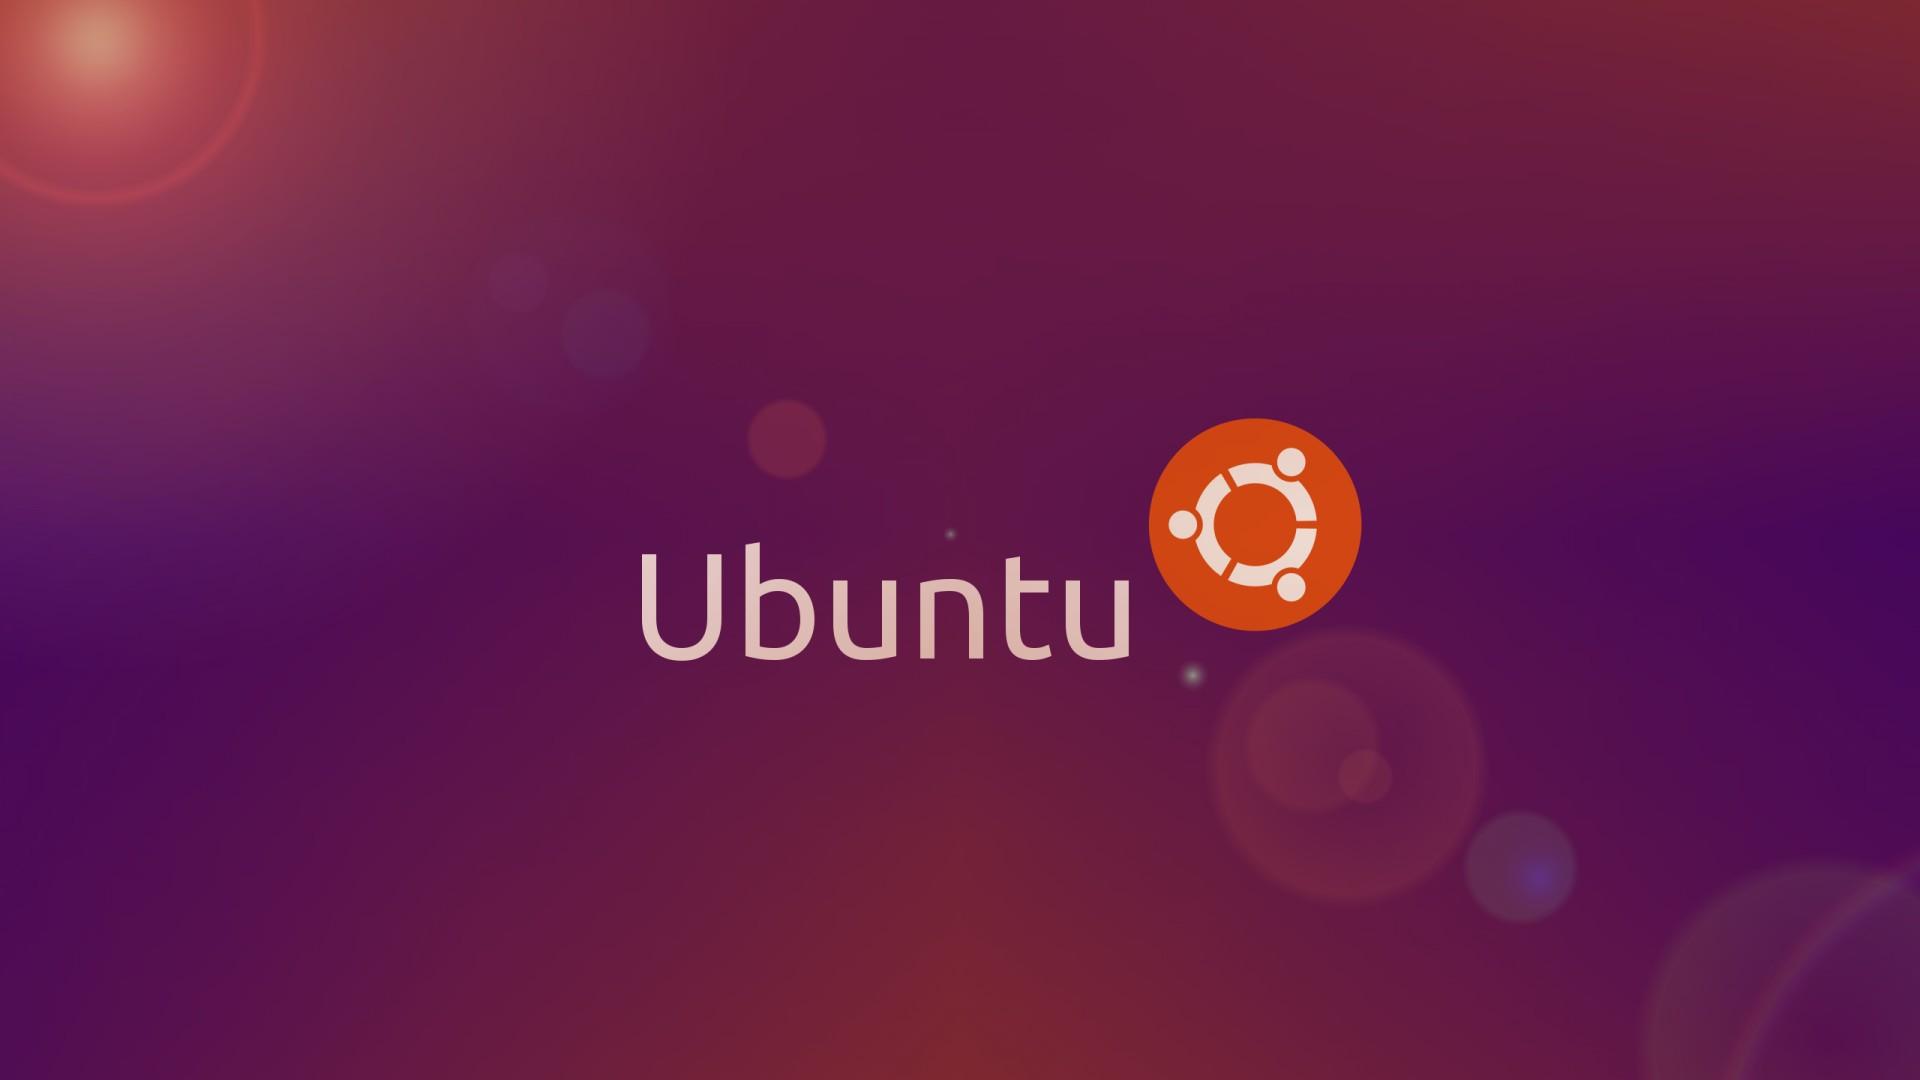 Ubuntu Wallpapers High Definition Wallpaper 1920x1080 1920x1080